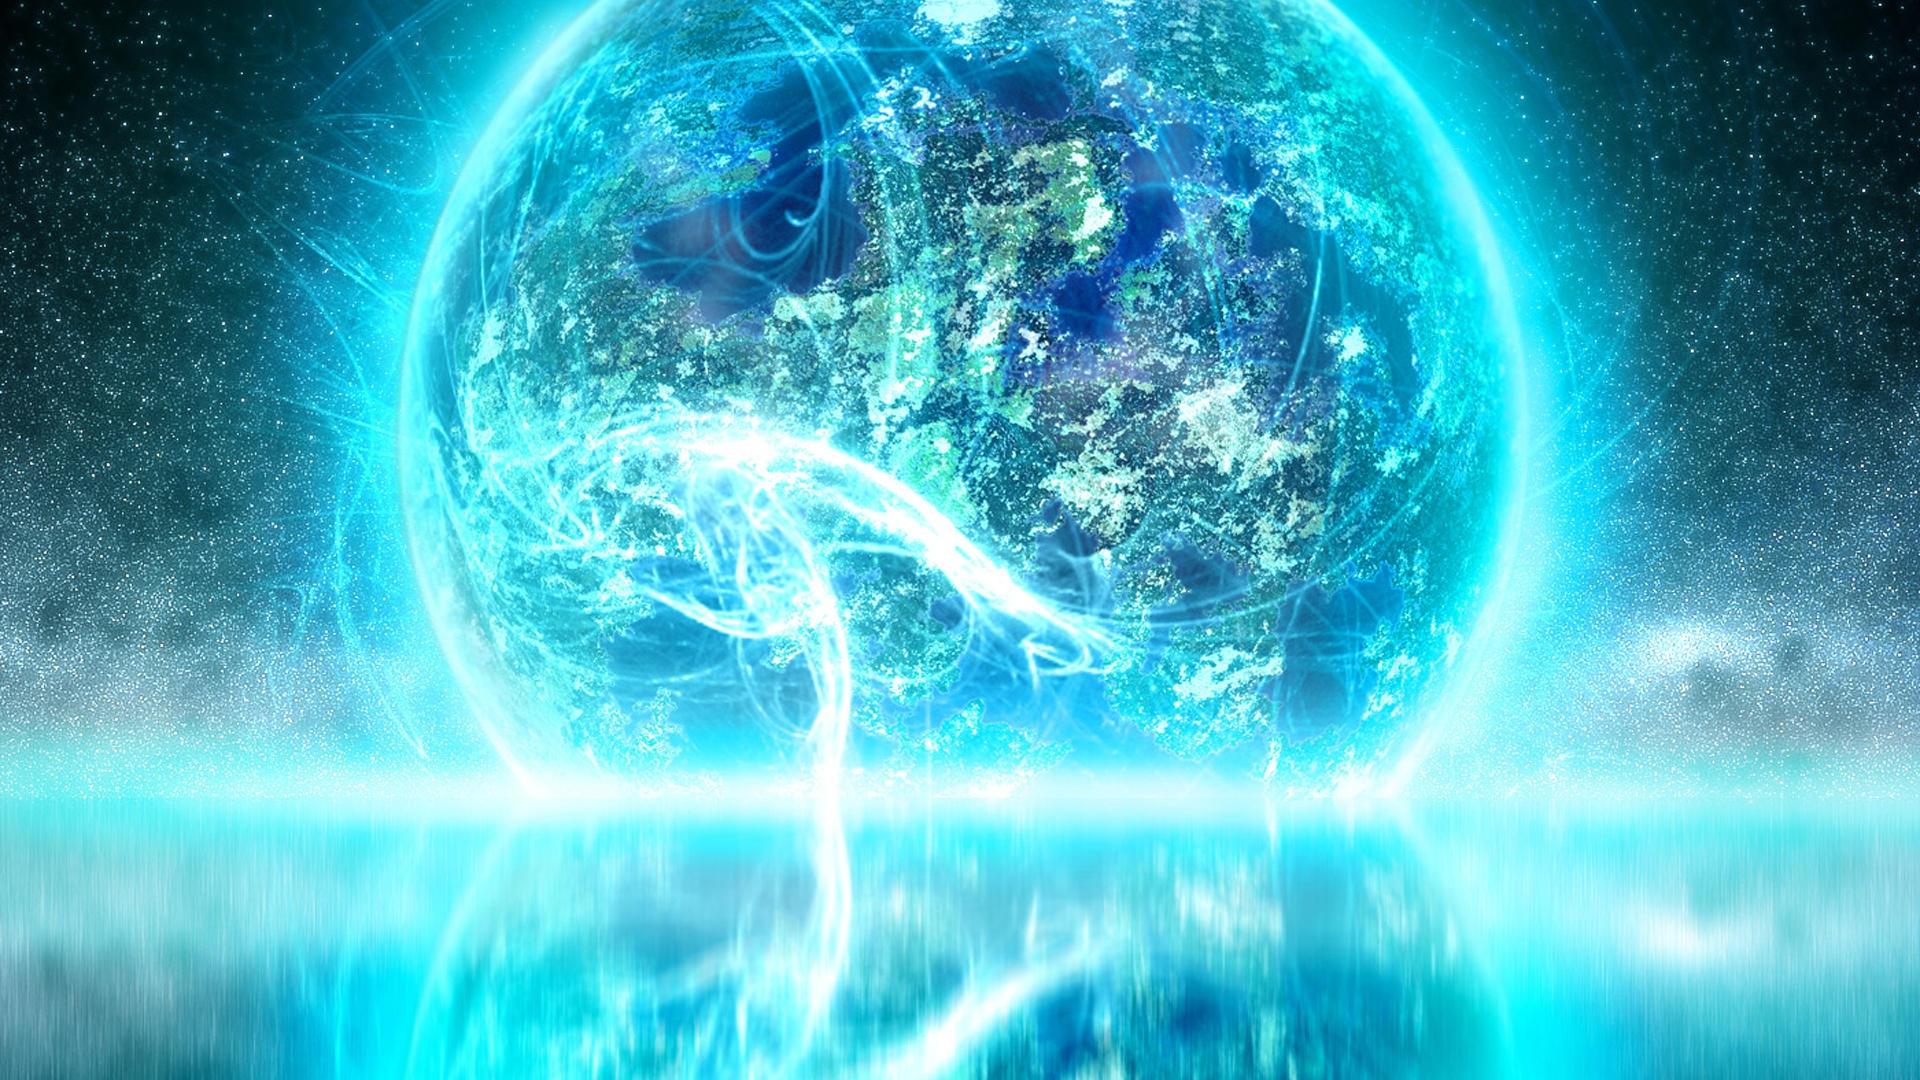 Planet Explosion Neon Glow